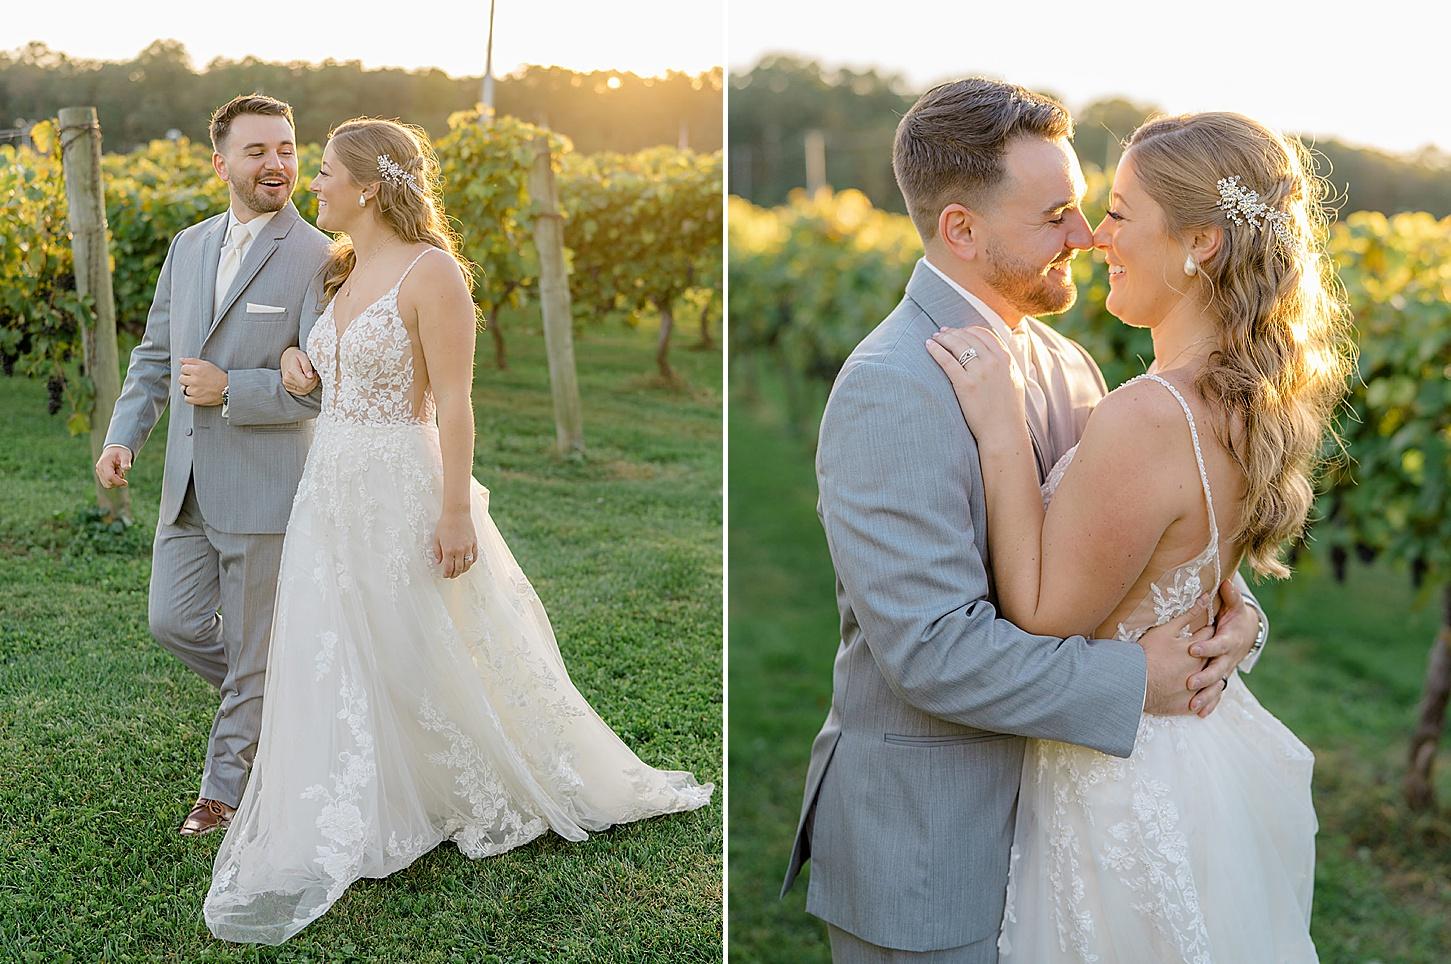 Valenzano Winery Vitners Pavillion Wedding Photography by Magdalena Studios 0035